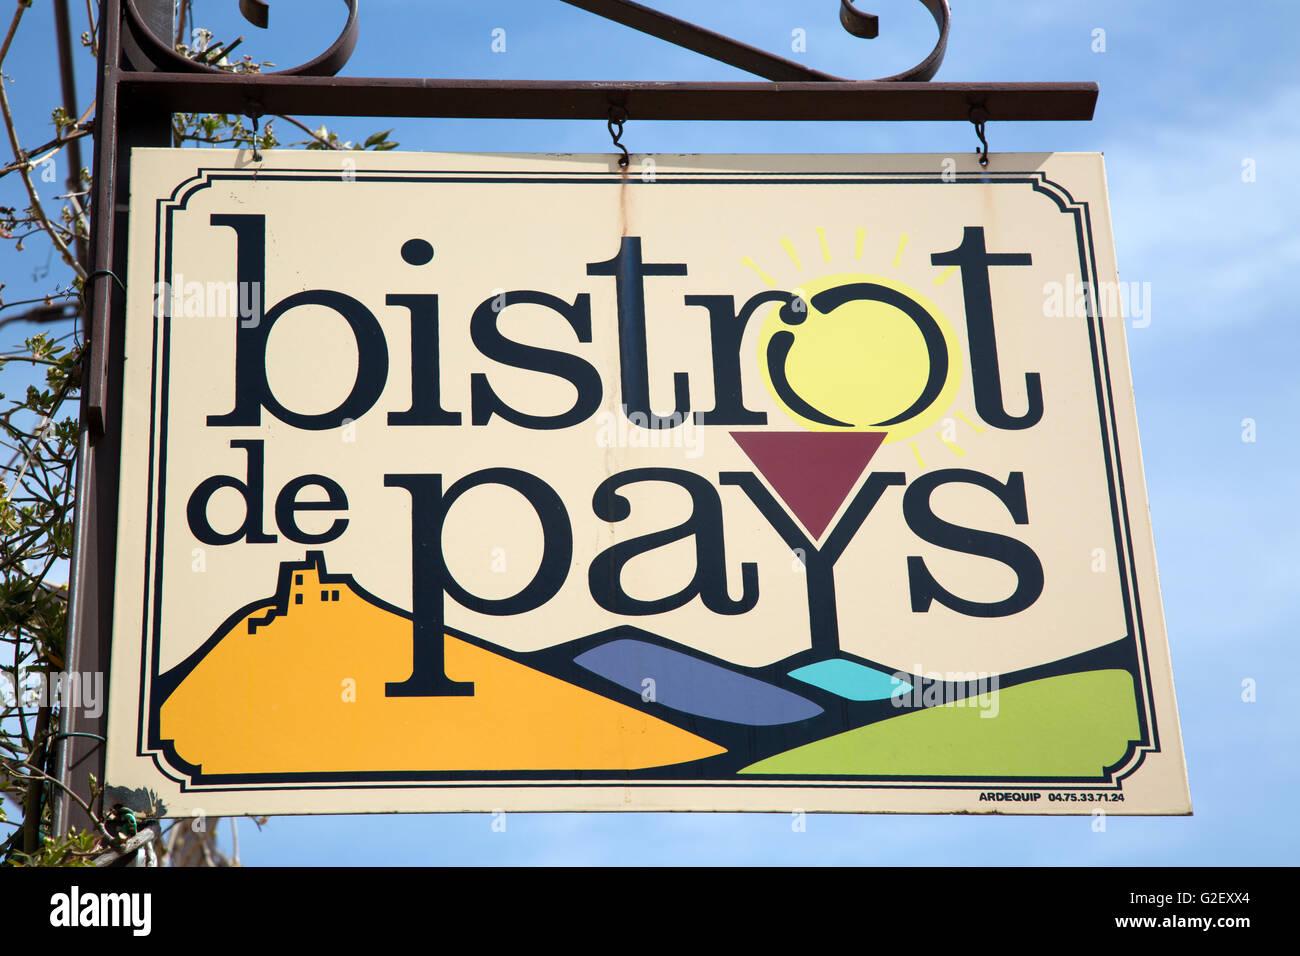 Bistrot de Pays Restaurant Sign, Provence, France, Europe - Stock Image